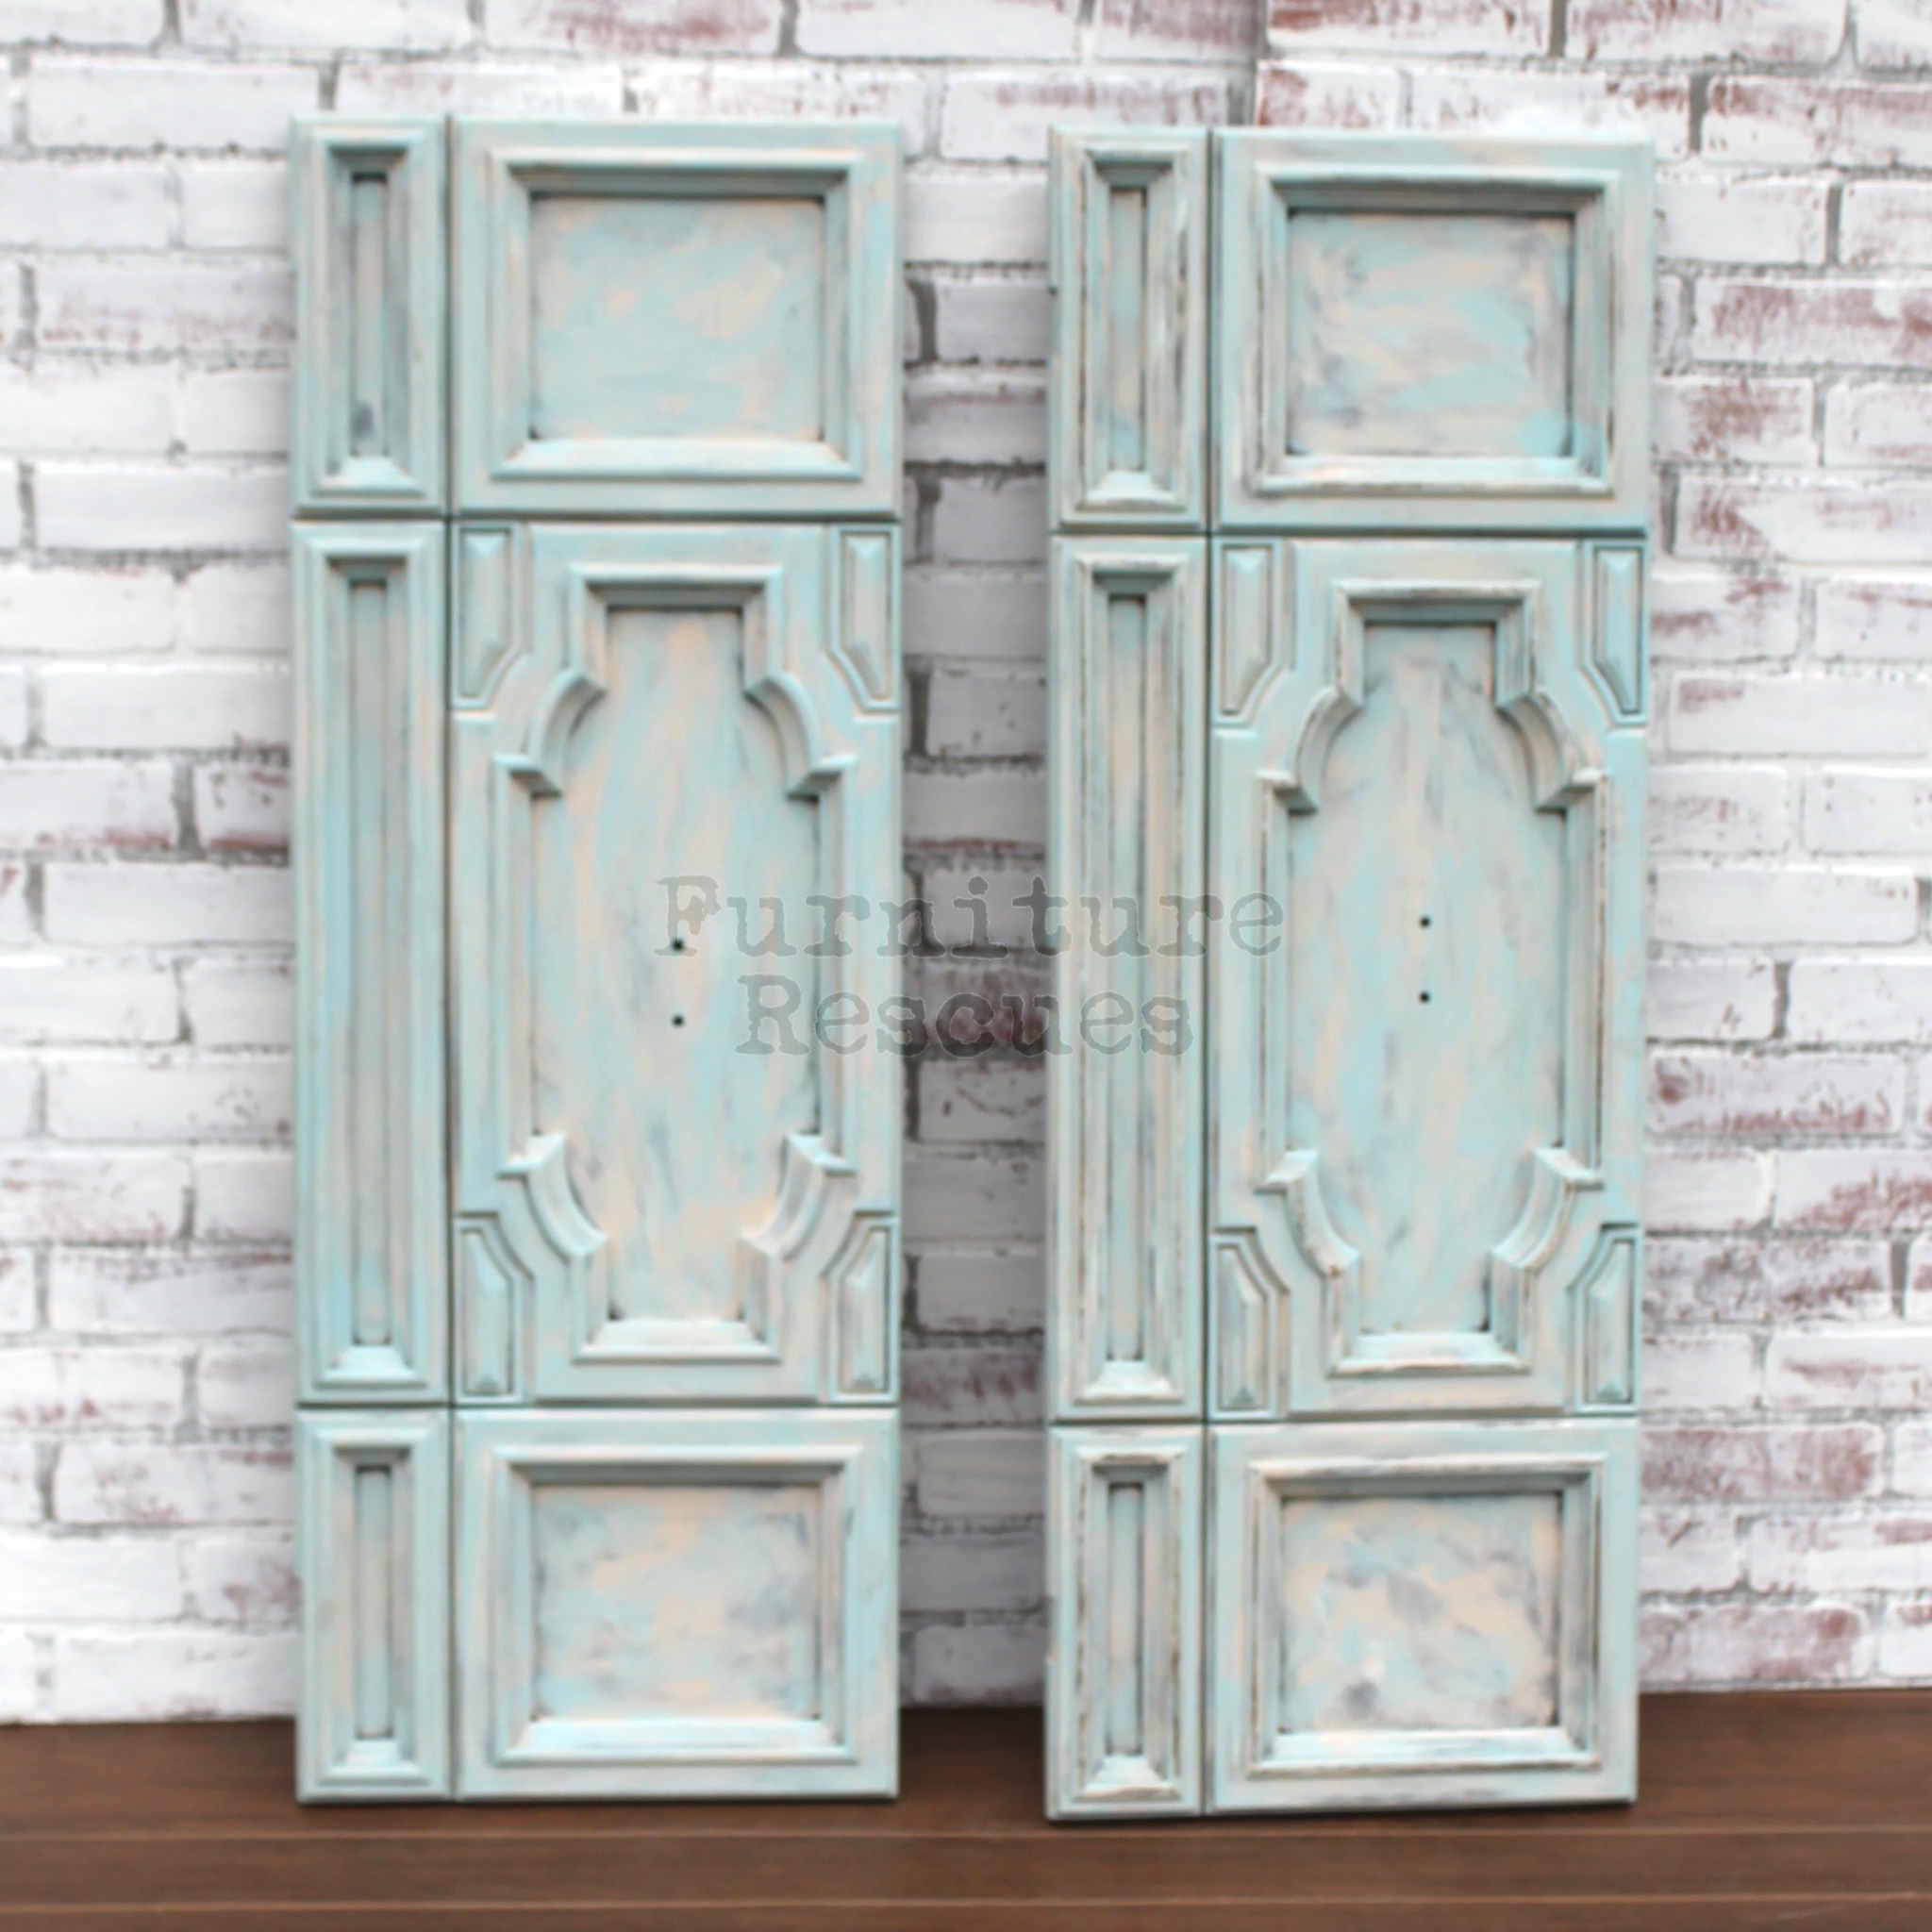 Decorative Door Panels Furniture Rescues